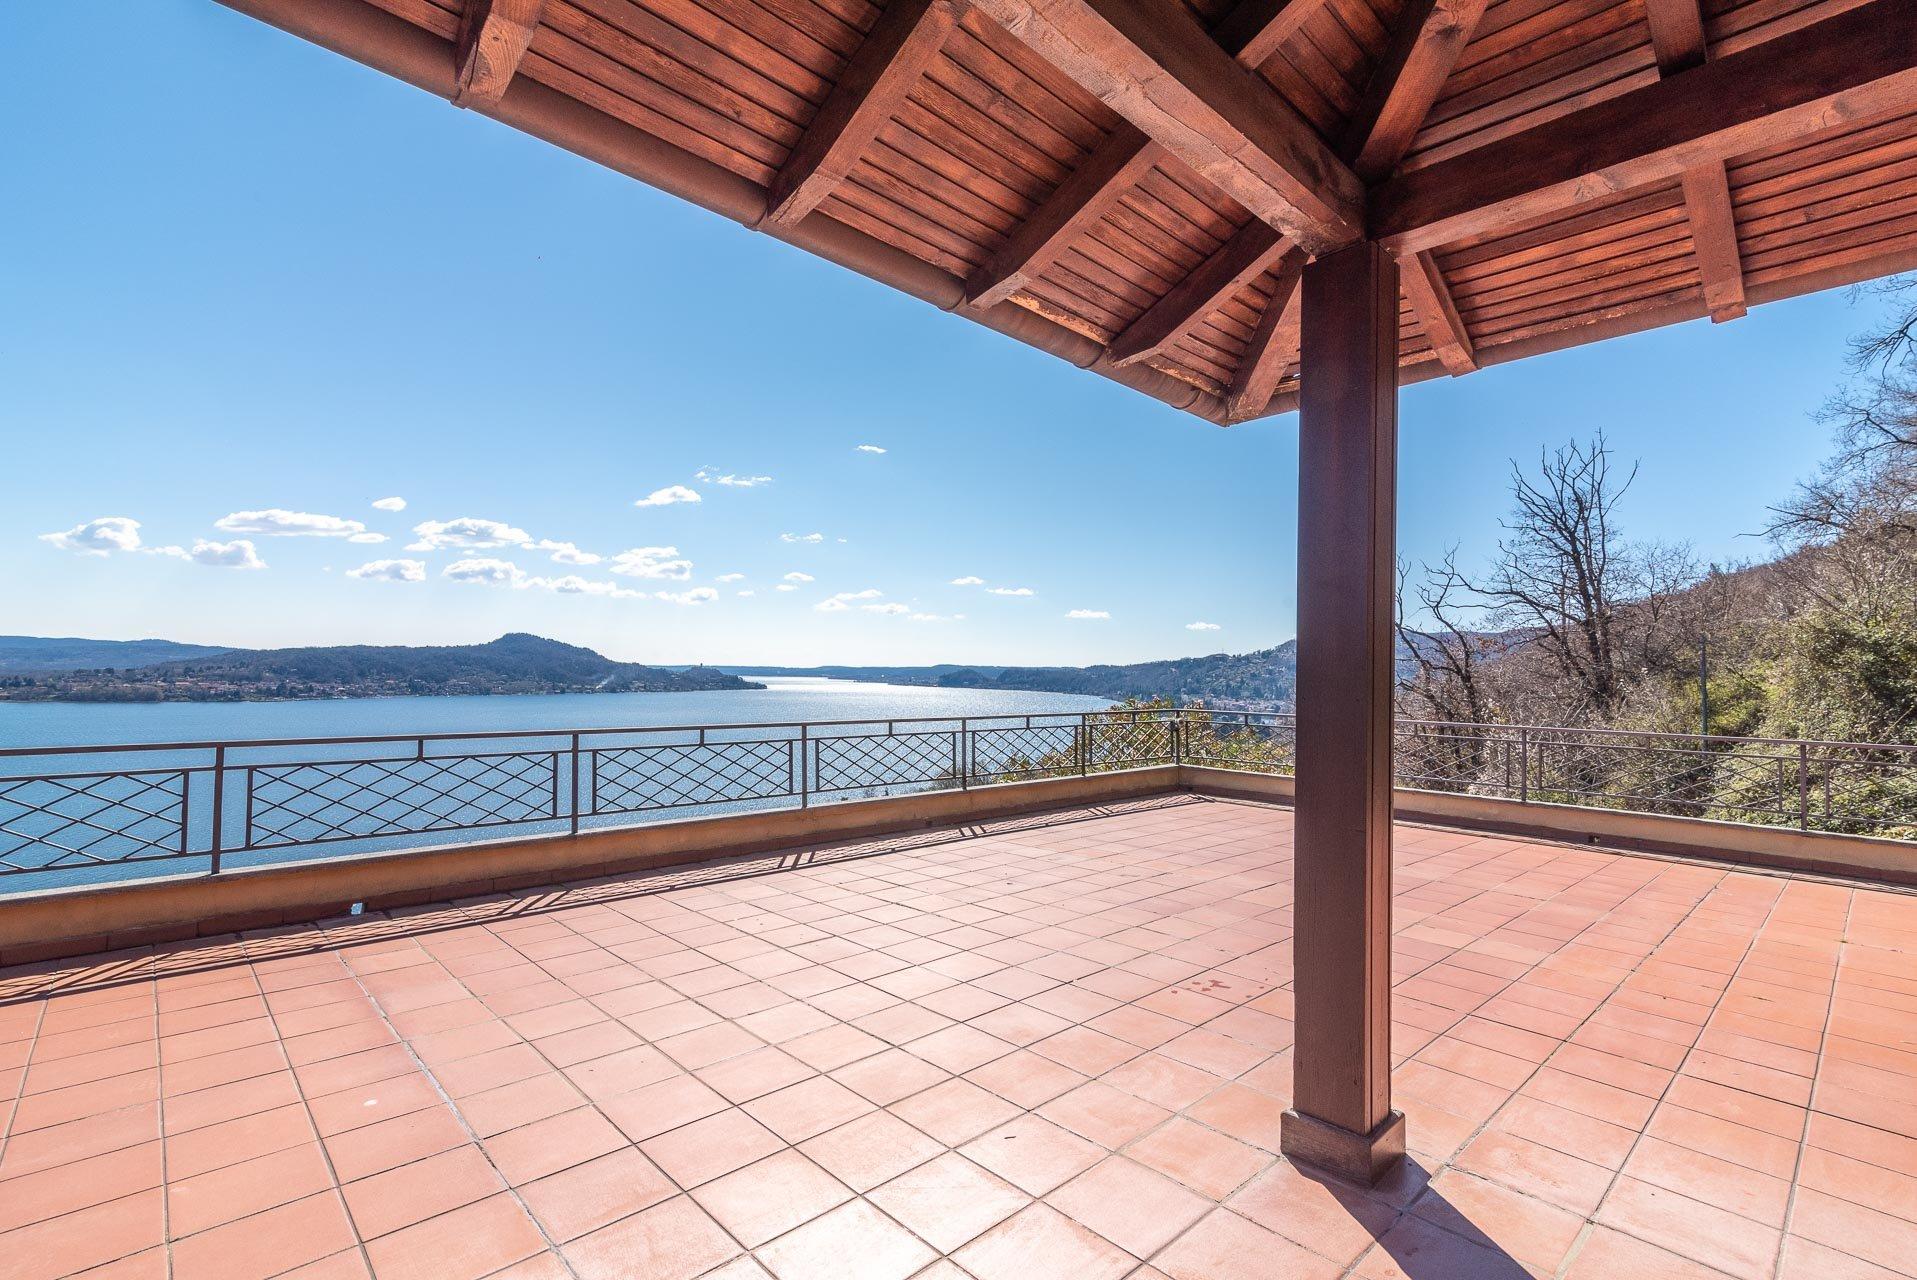 Villa auf den Hügeln des Lago Maggiore mit Swimmingpool.